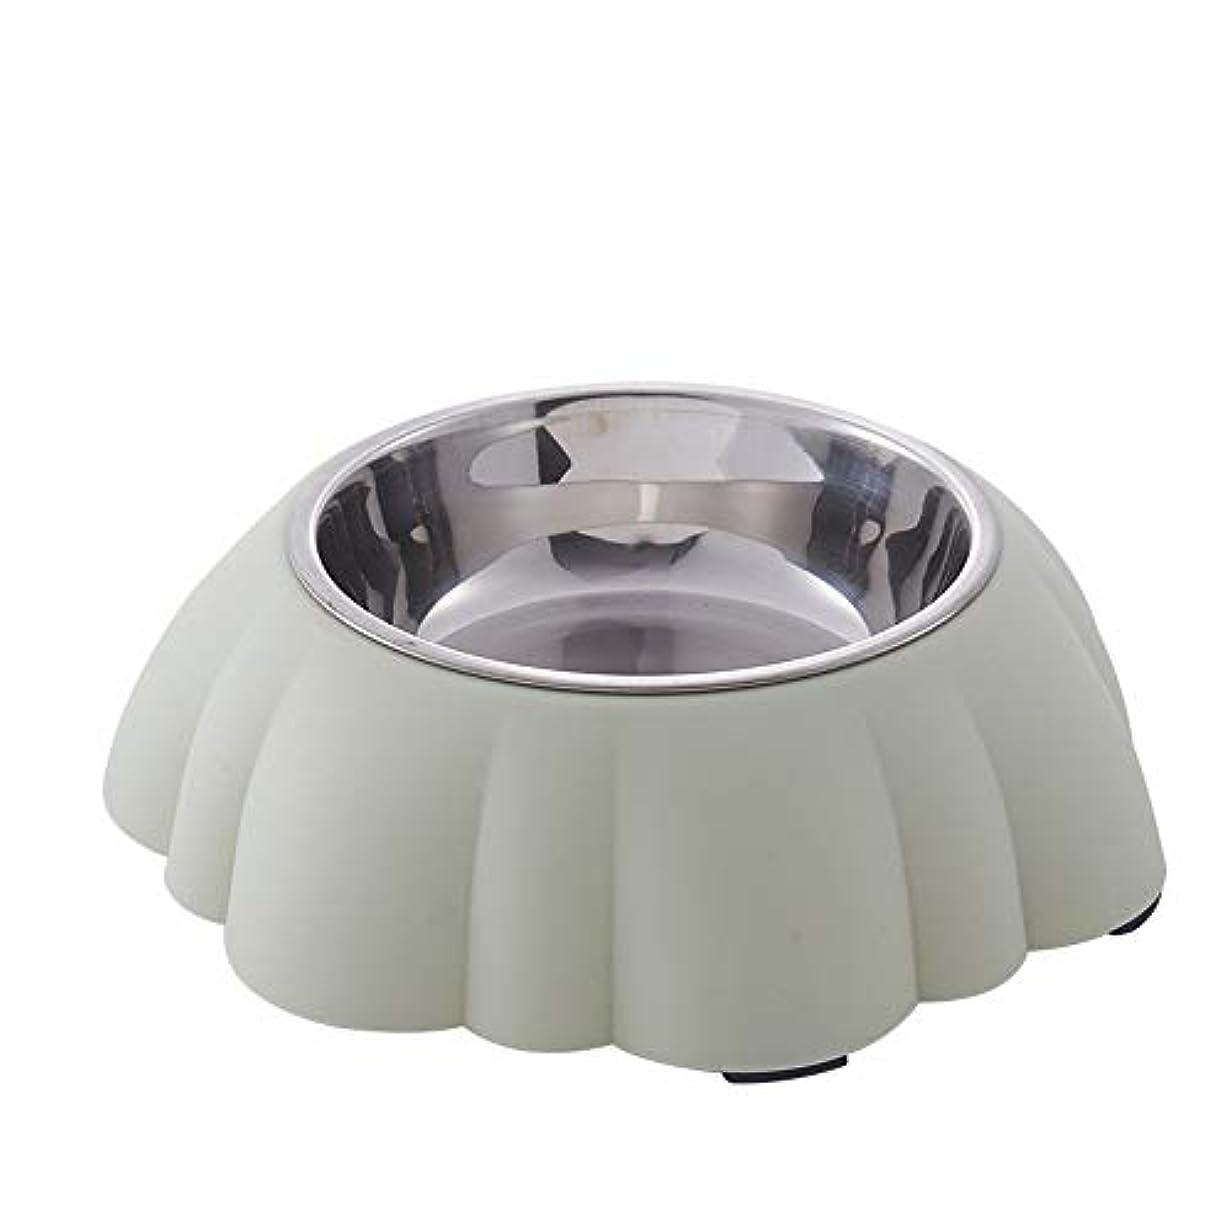 NANI_PET両用ペット食器 犬猫用食器 餌入れ 給水器 ステンレス製 食べやすい ウォーターボトル 滑り止め 細菌の繁殖を抑える 早食い防止グリーン